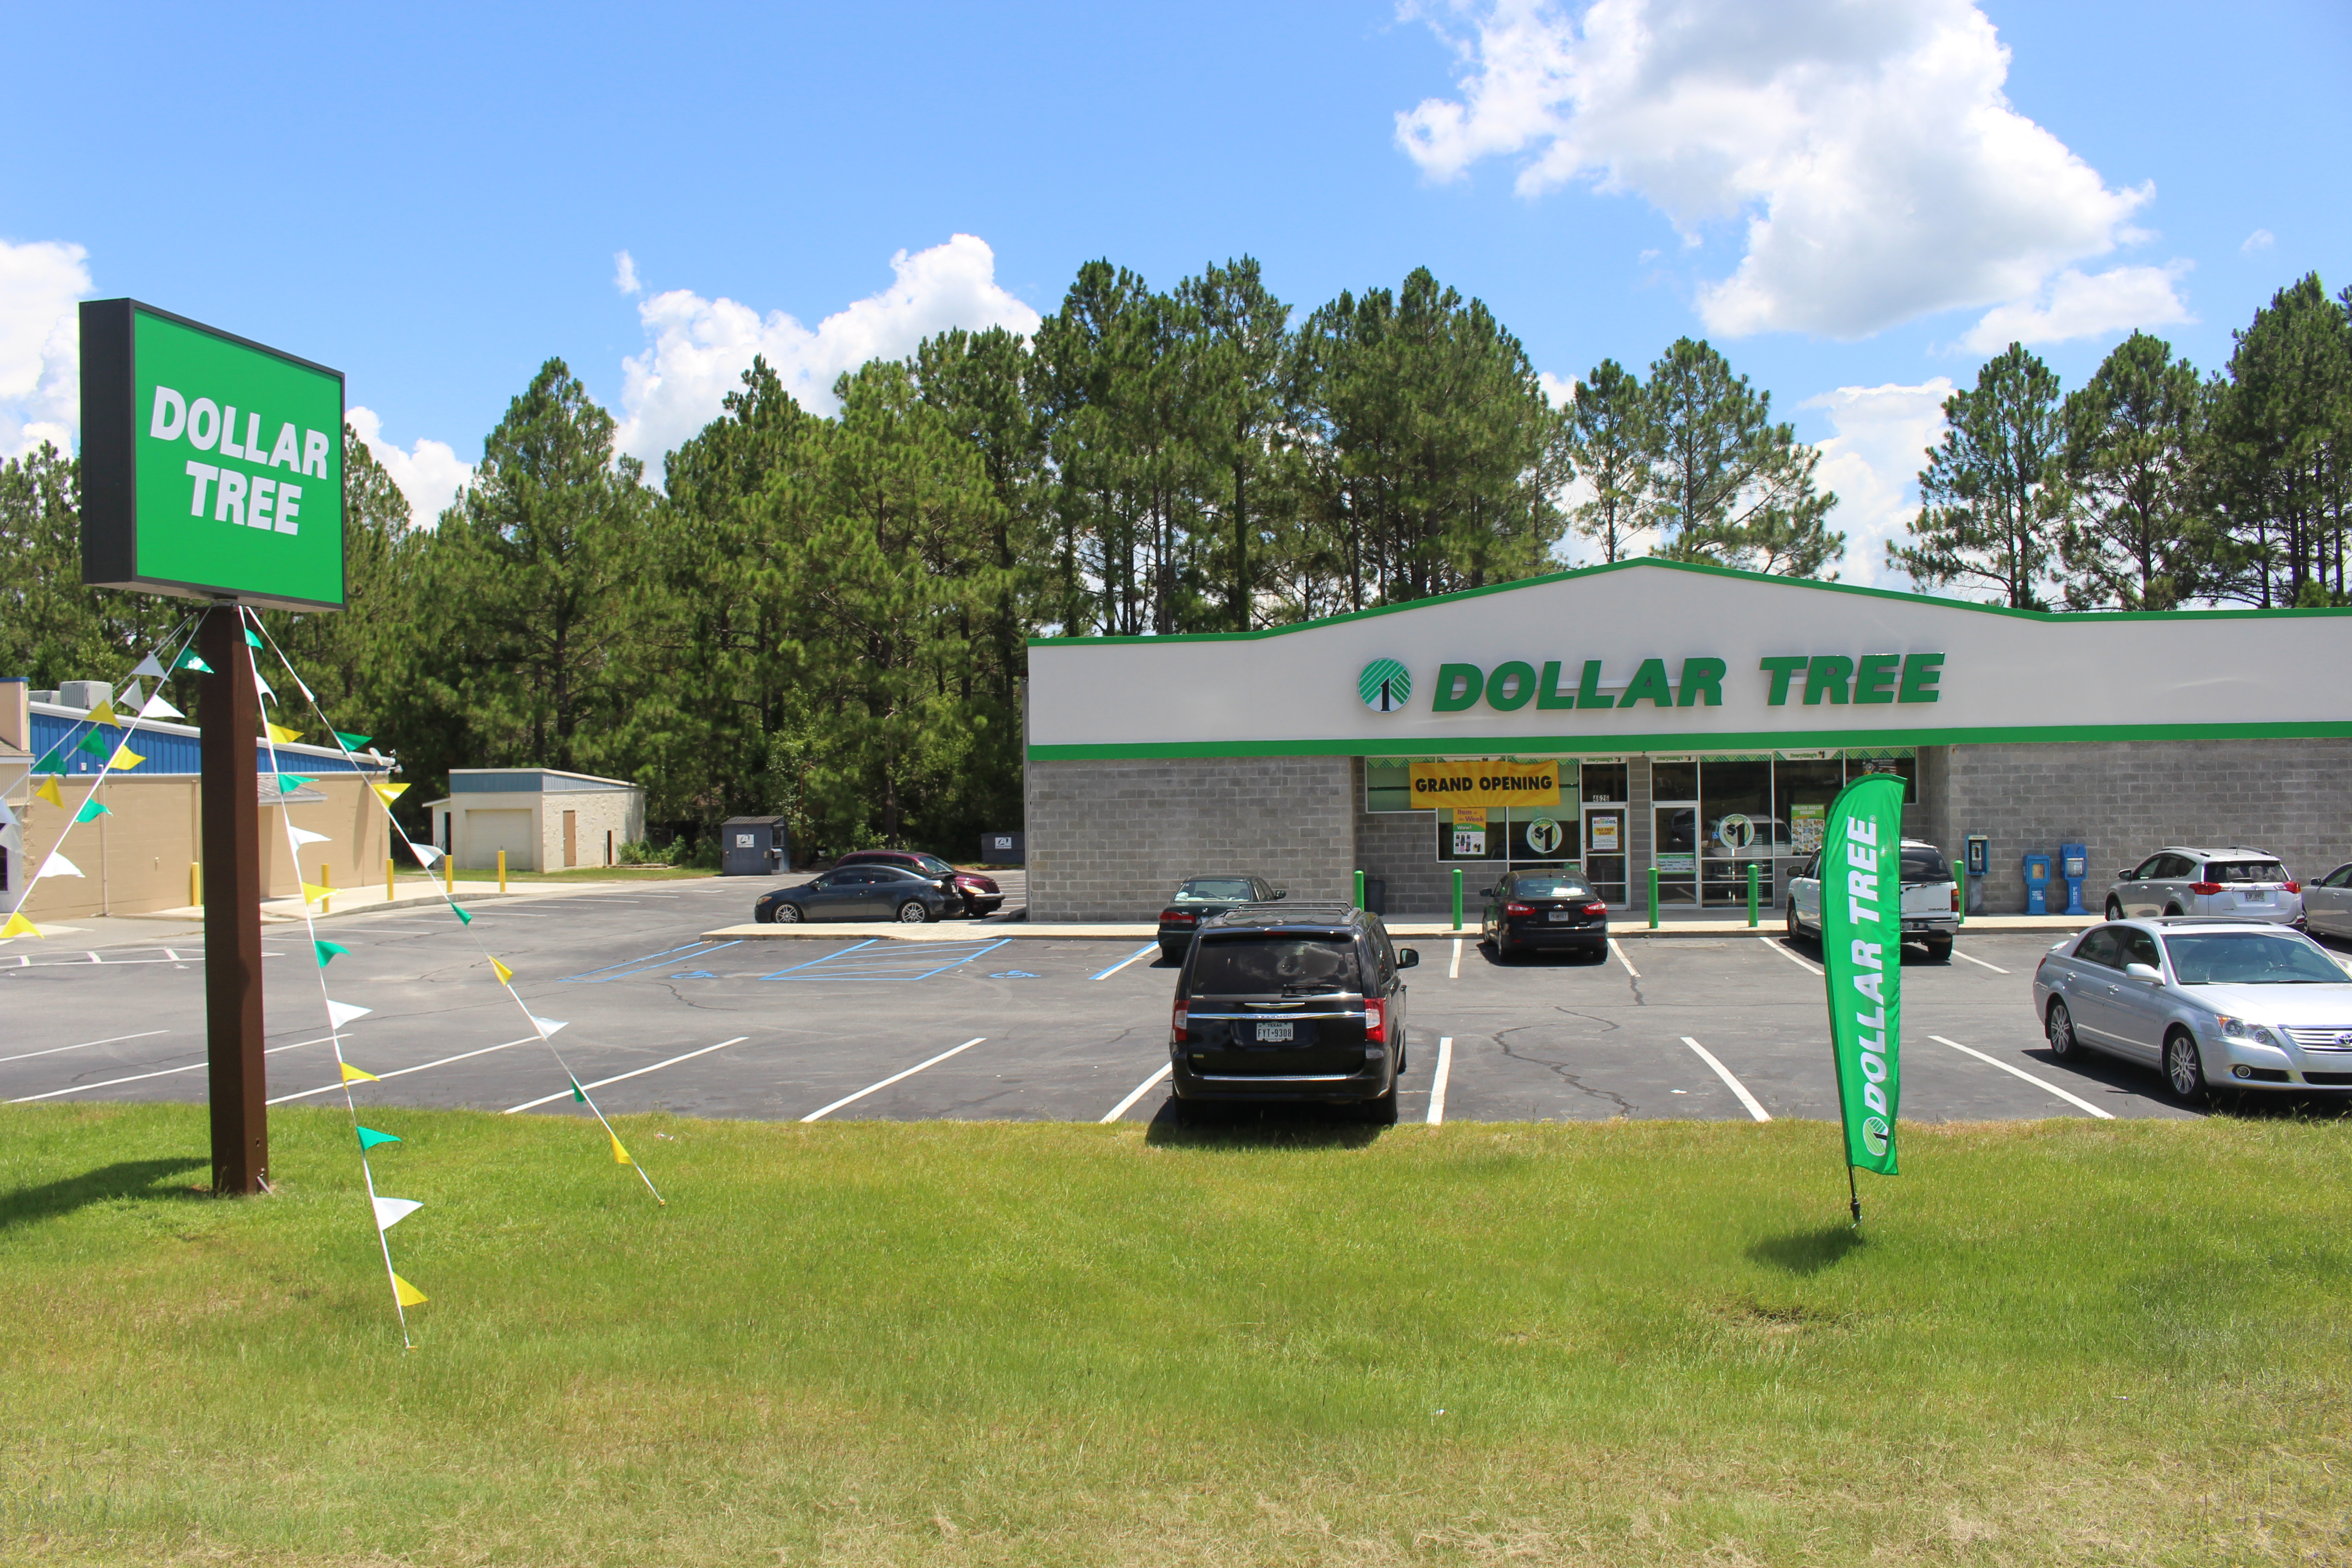 File:Dollar Tree, Bemiss Rd, Lowndes County jpg - Wikimedia